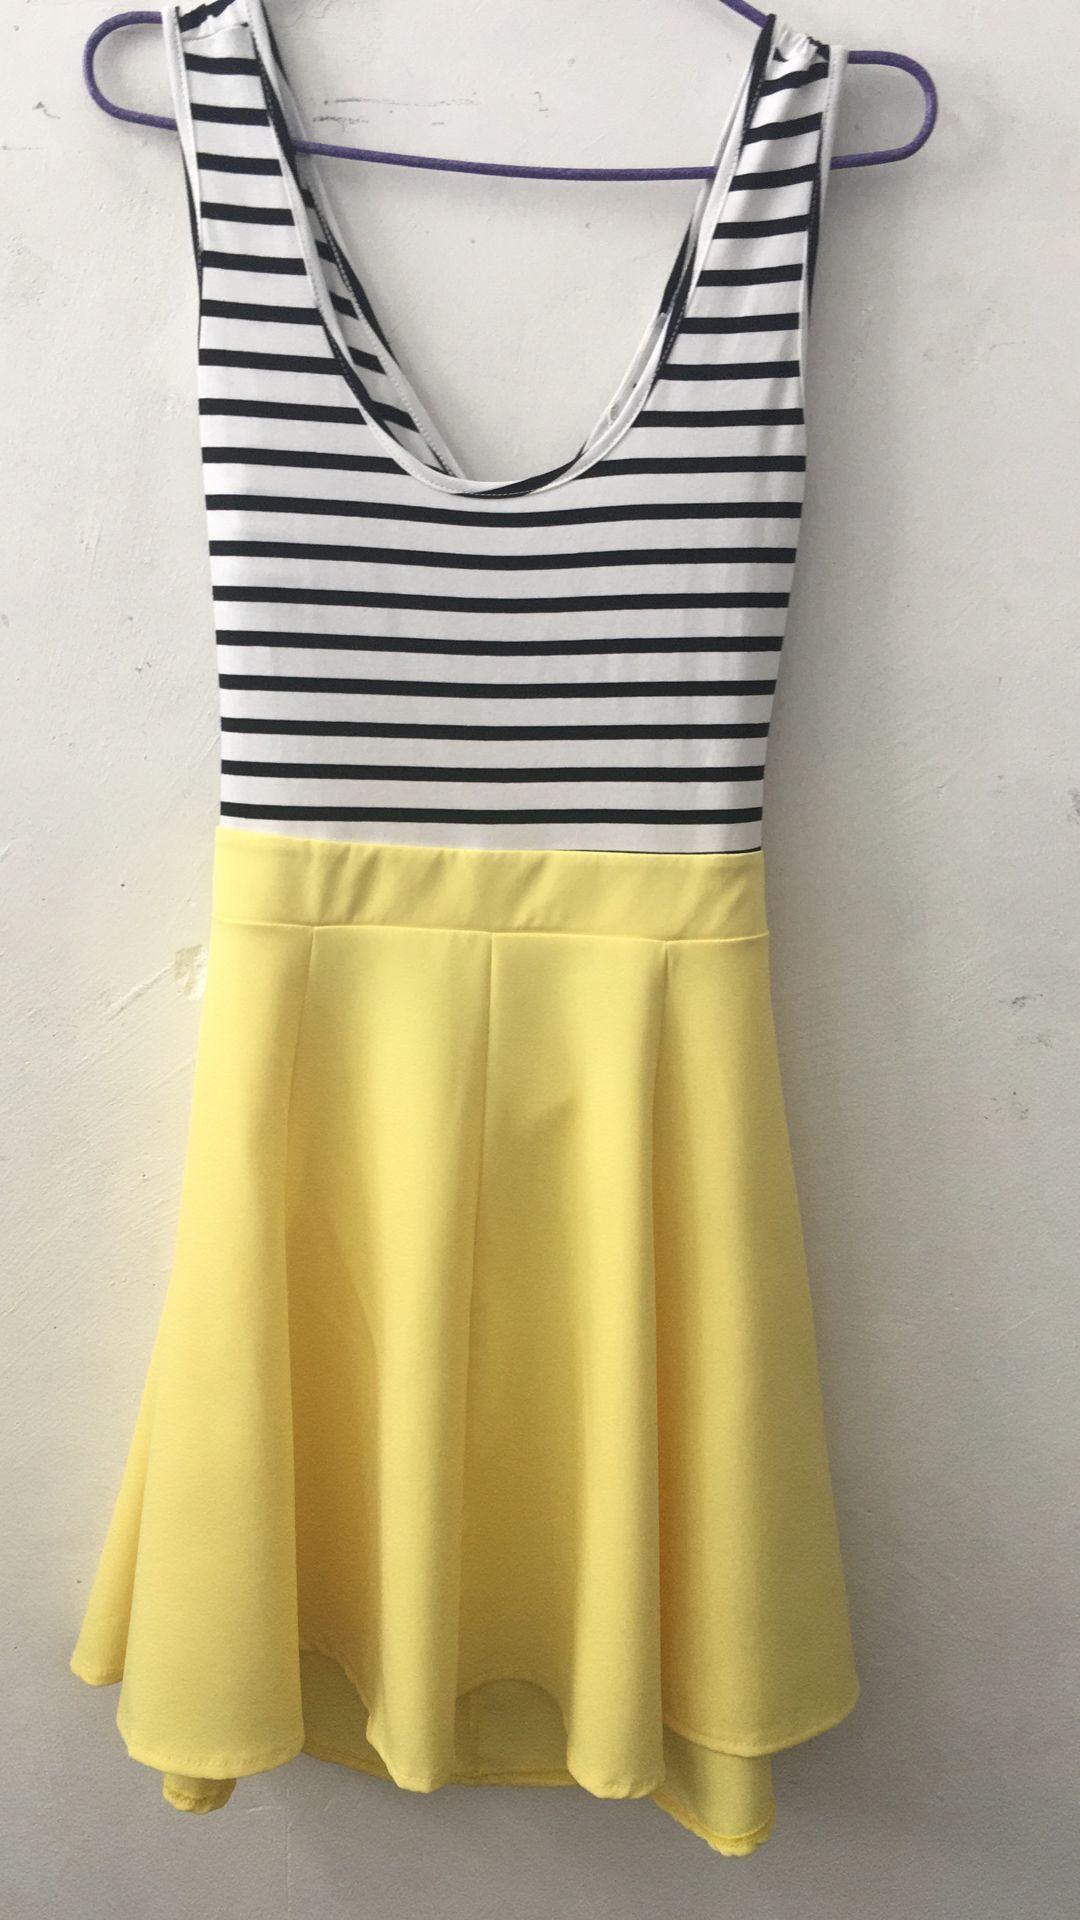 [US Direct] Ladies Open Back Sleeveless Slim Fit Striped Casual Cute Mini Dress Yellow_XL